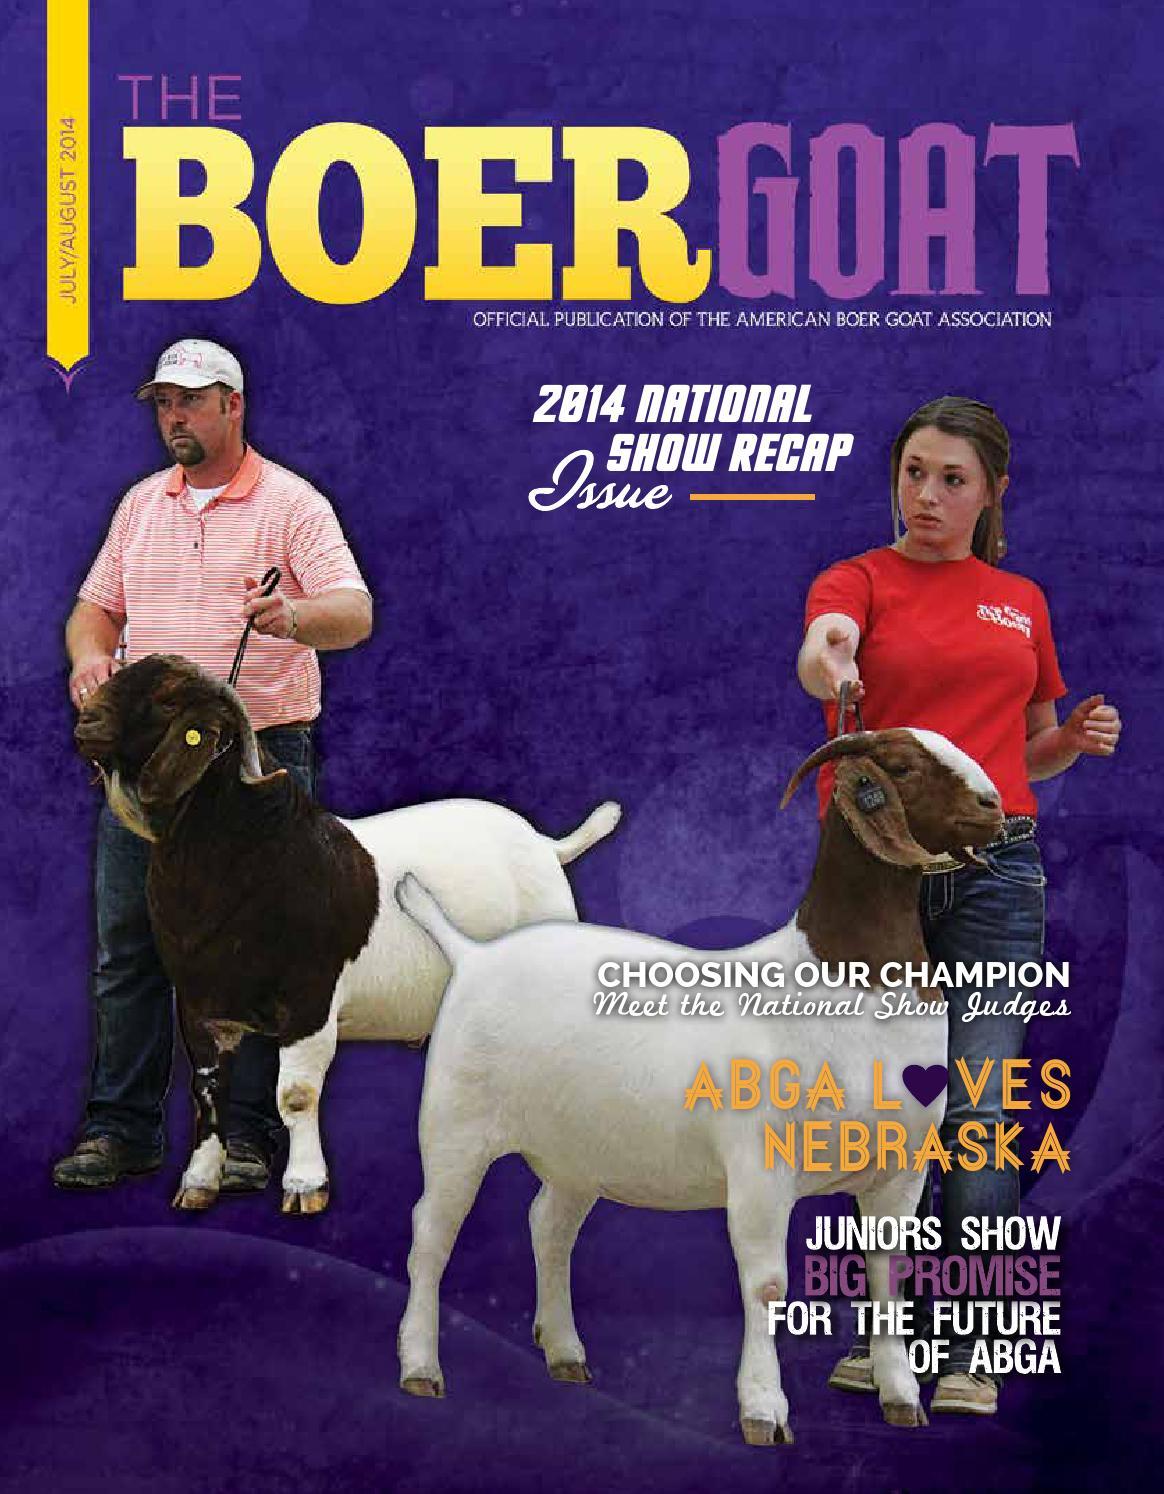 The Boer Goat - July/August 2014 by American Boer Goat ... - photo#39